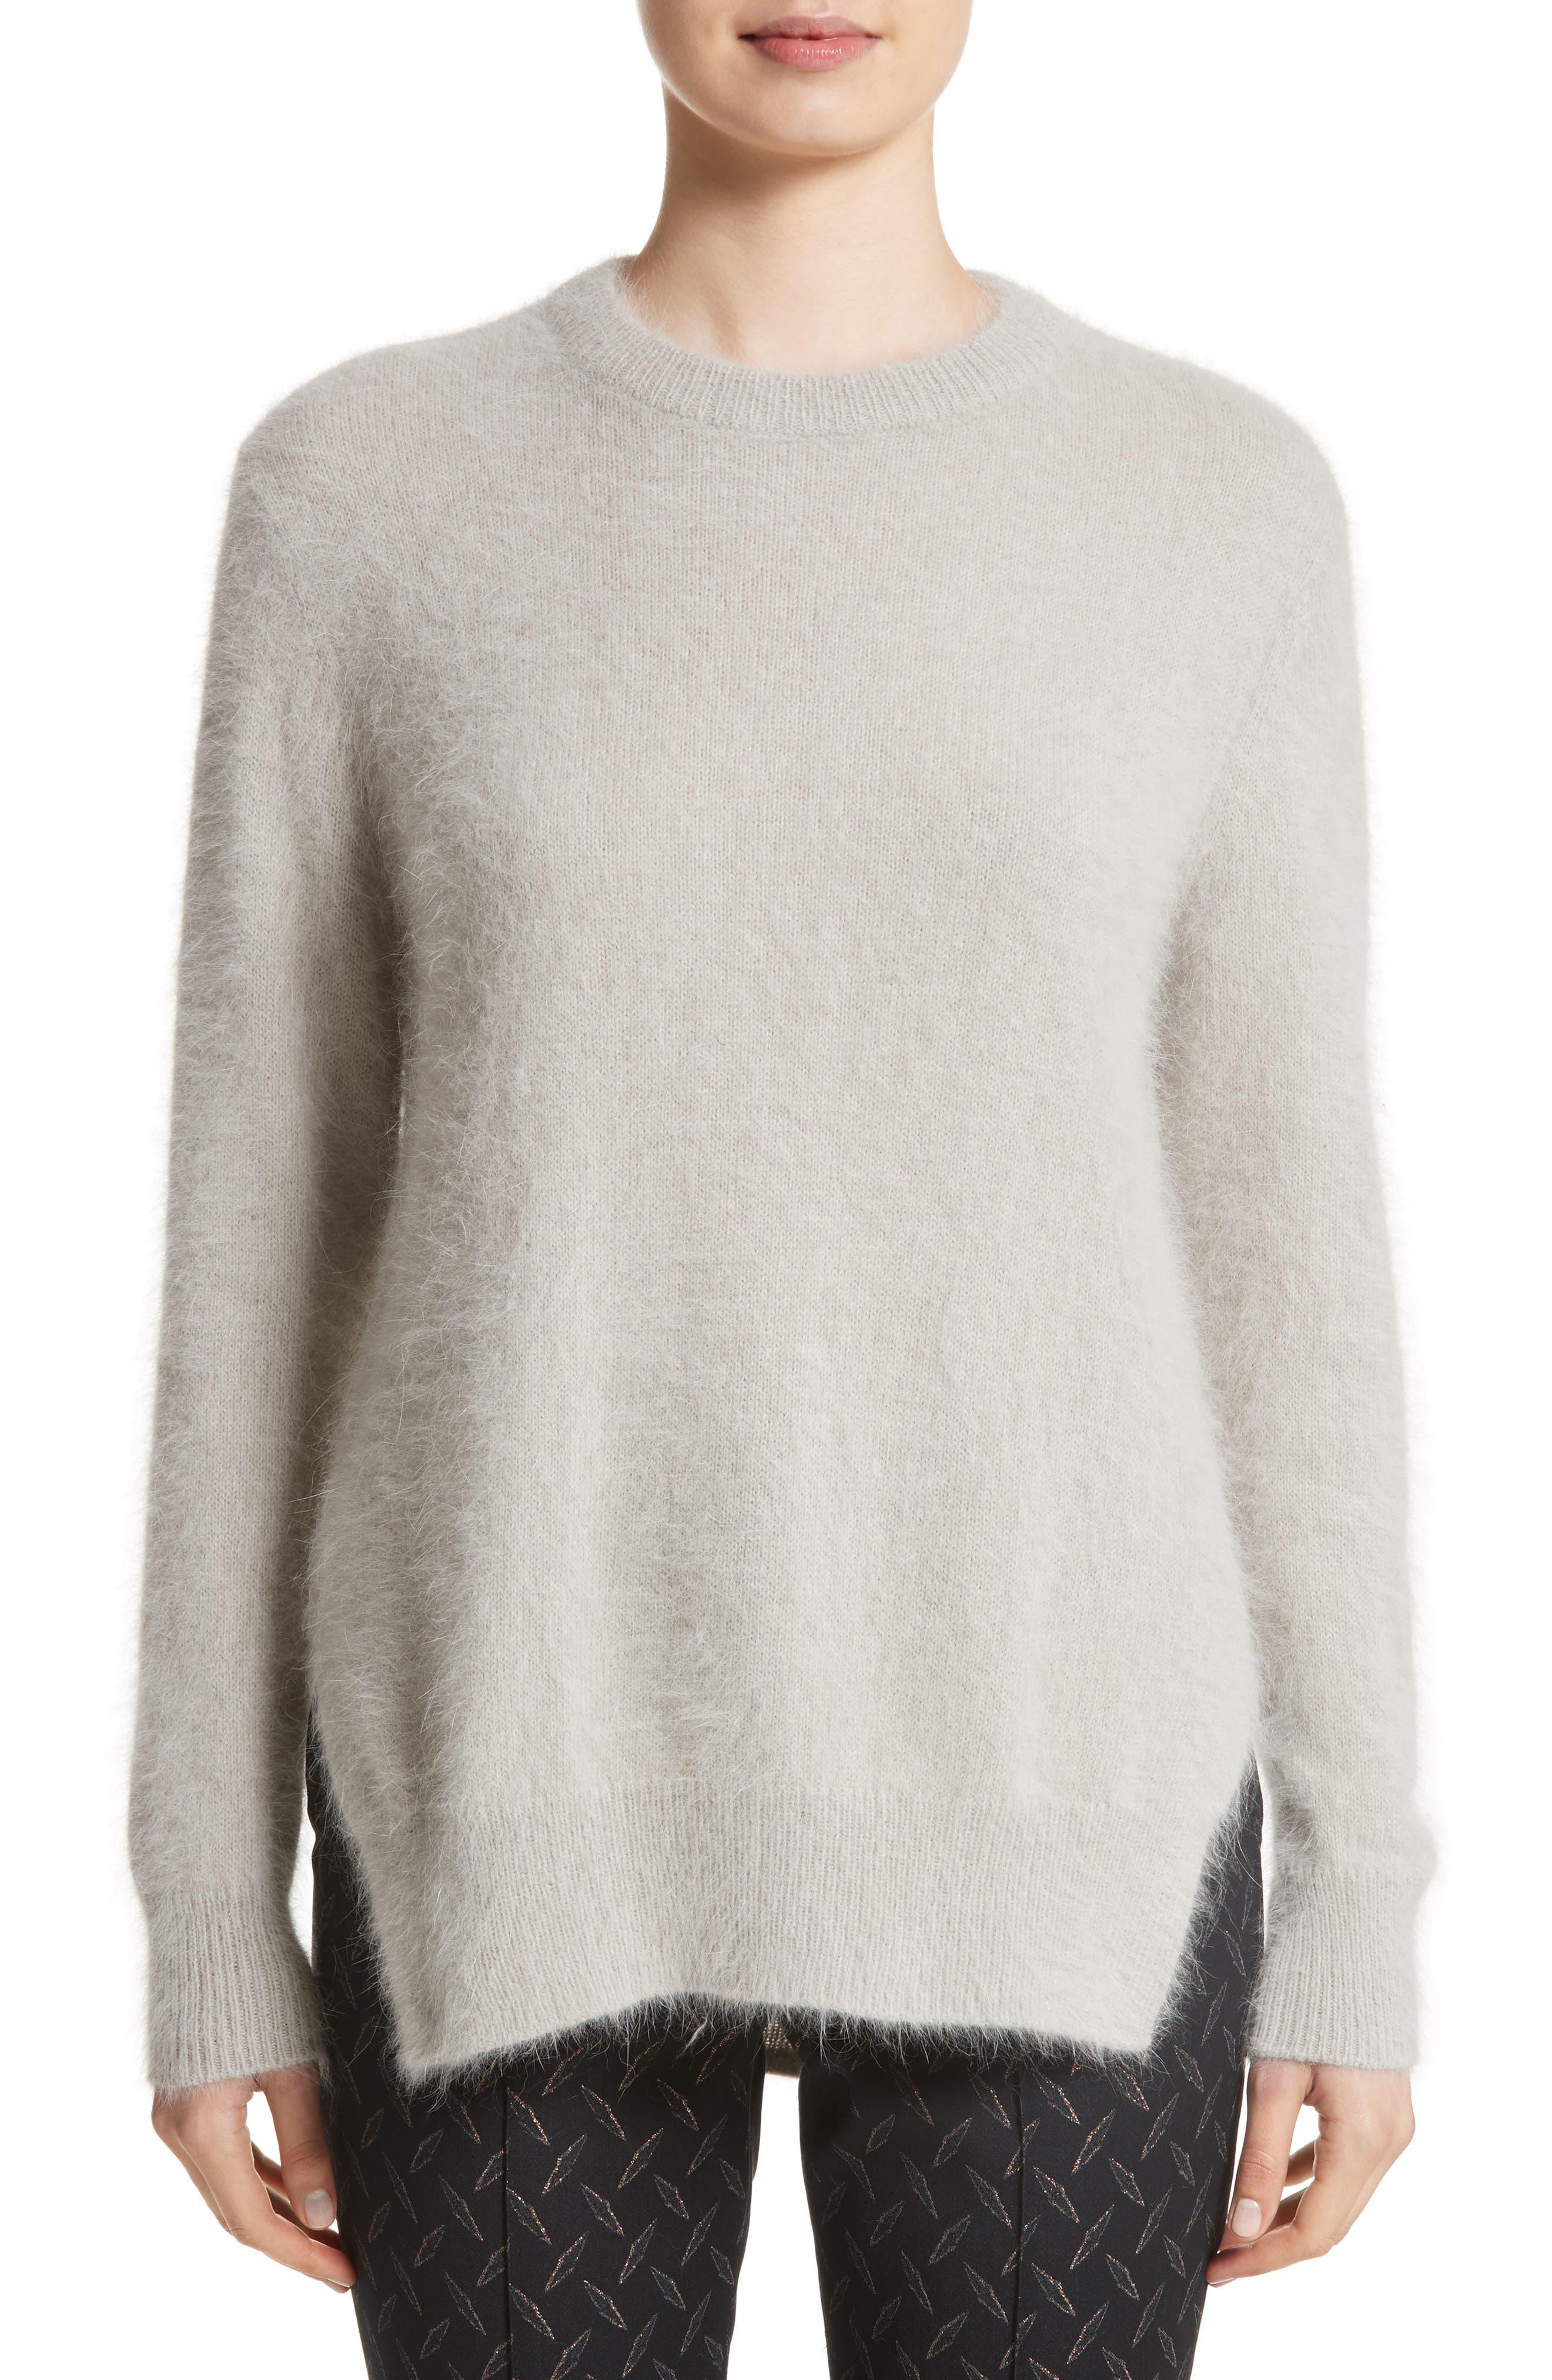 Alternate Image 1 Selected - Yigal Azrouël Angora Blend Sweater